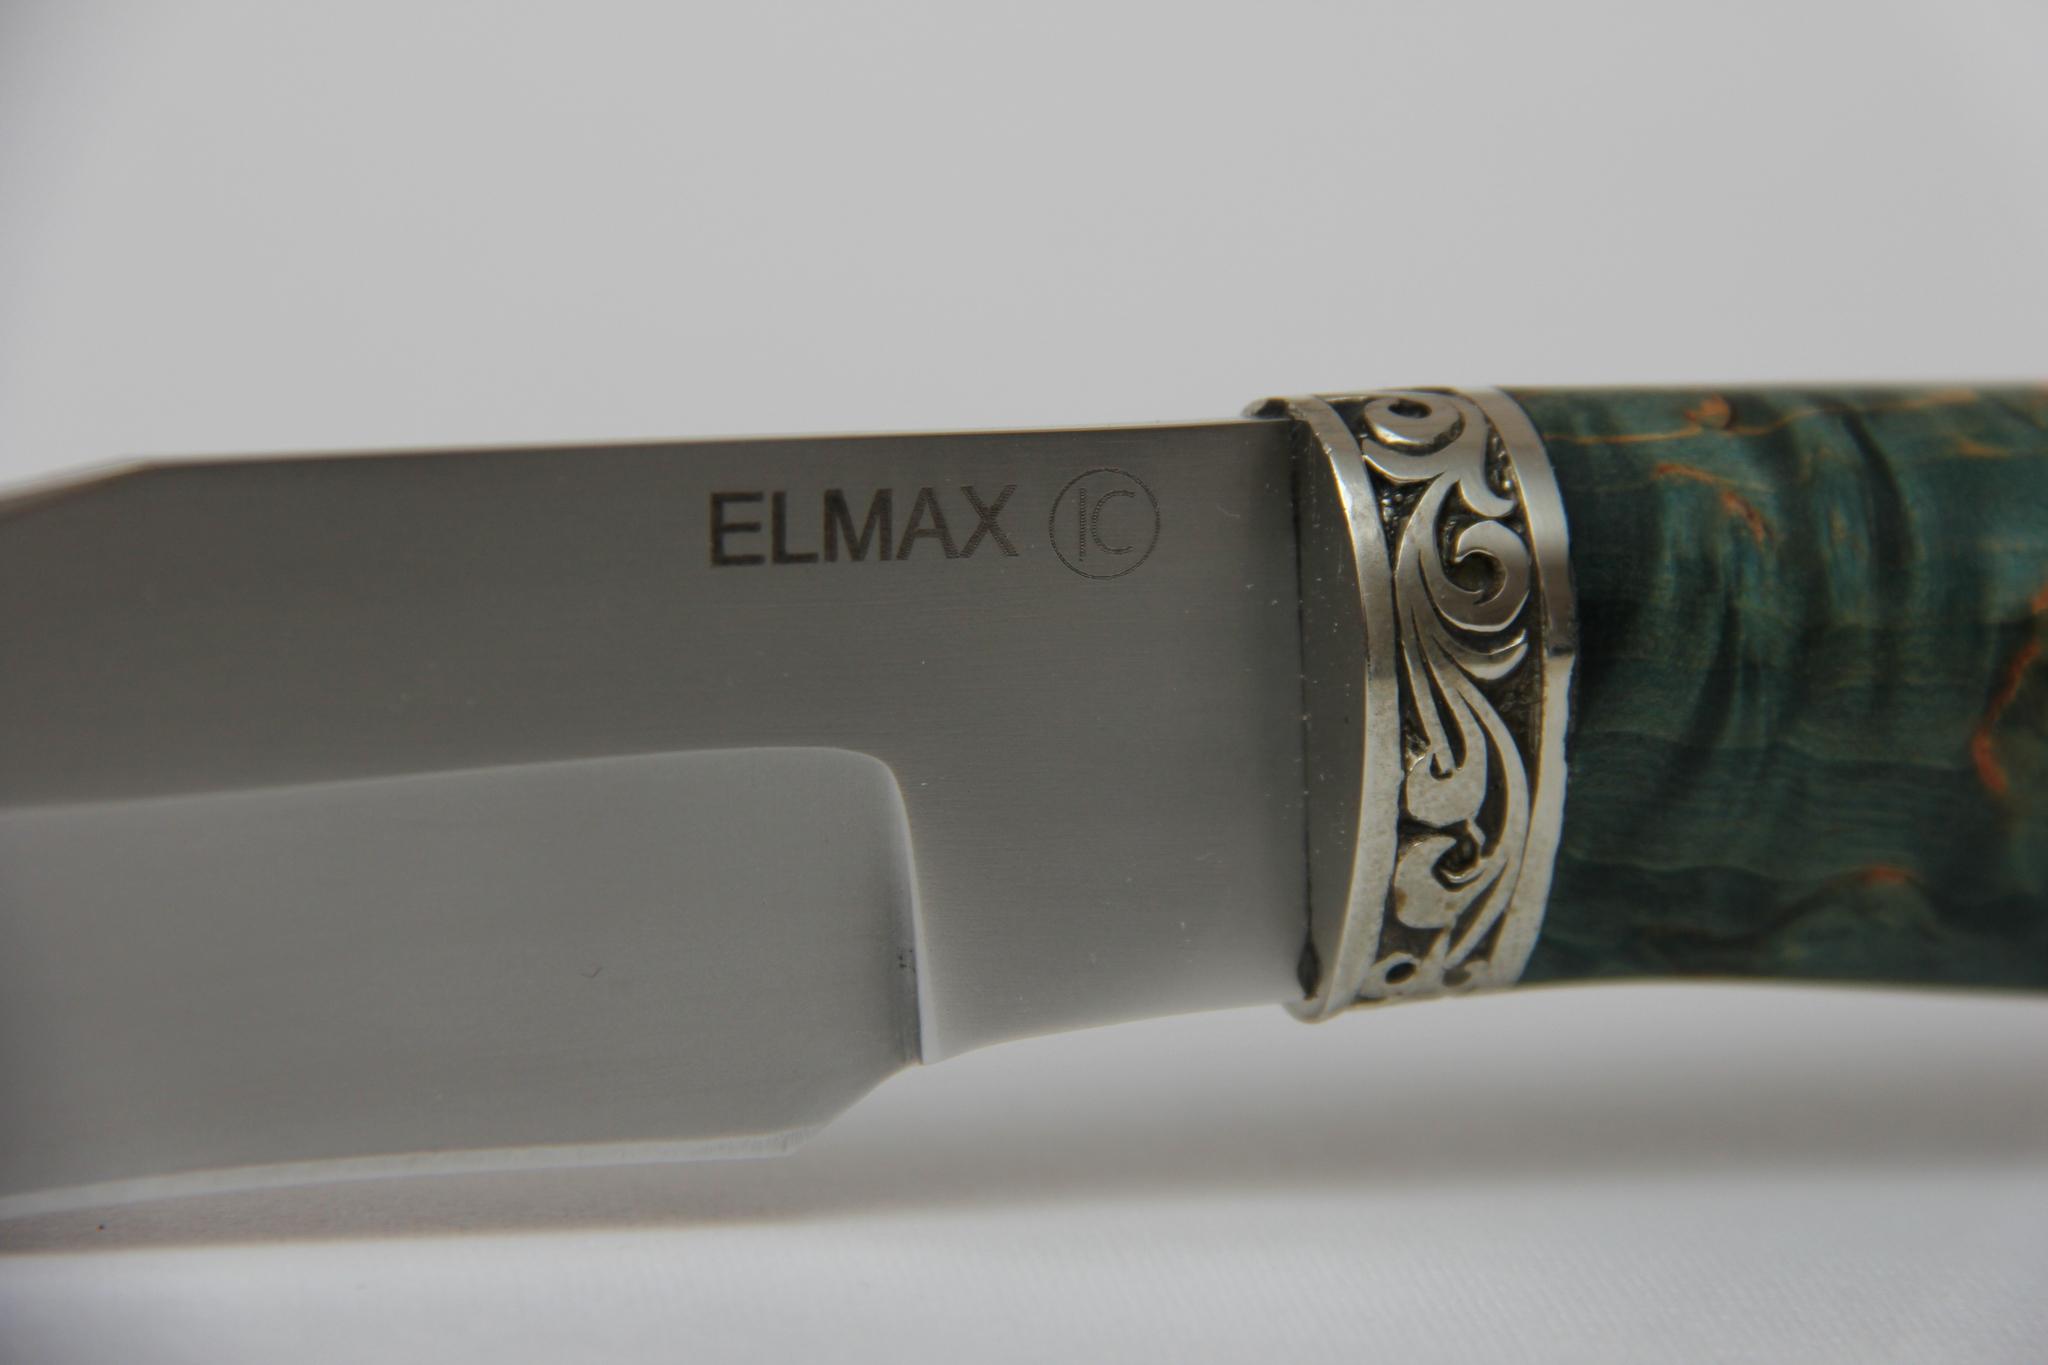 Нож от мастерской Князевых